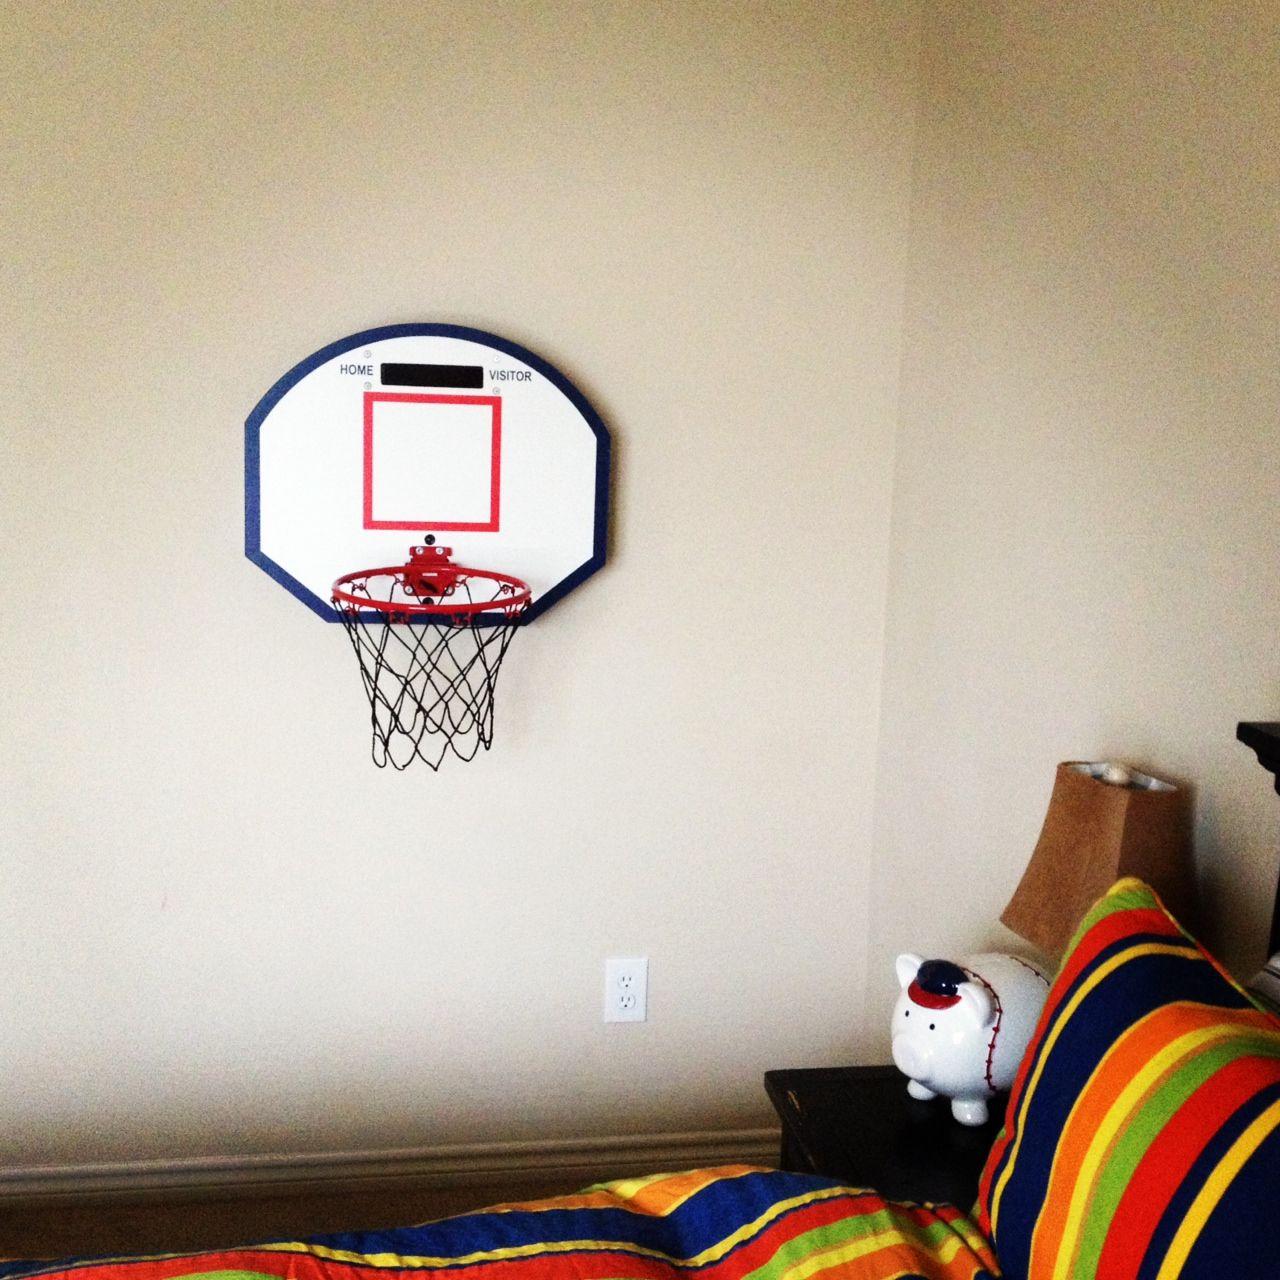 A hoop in my room caelainns bedroom indoor basketball - Indoor basketball hoop for bedroom ...